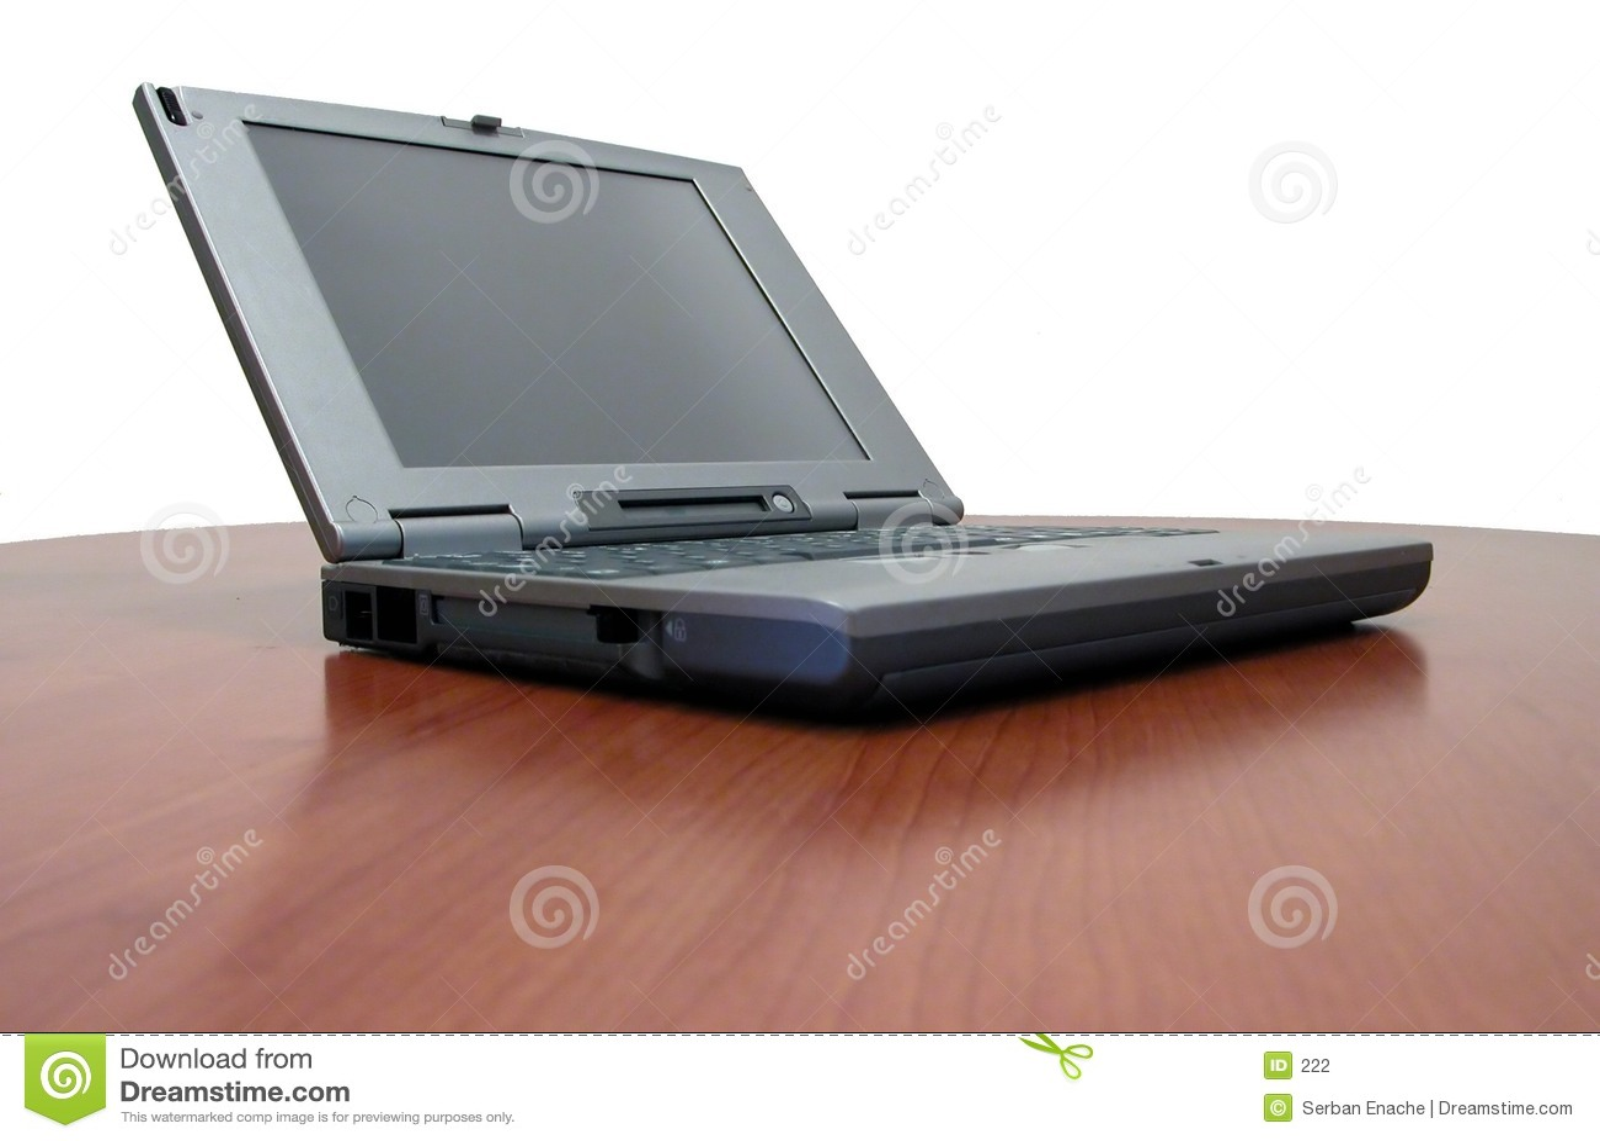 Download 樱桃服务台膝上型计算机 库存照片. 图片 包括有 办公室, 分析, 次幂, 计算器, 兼容, 通信, 微型, 桃花心木 - 222